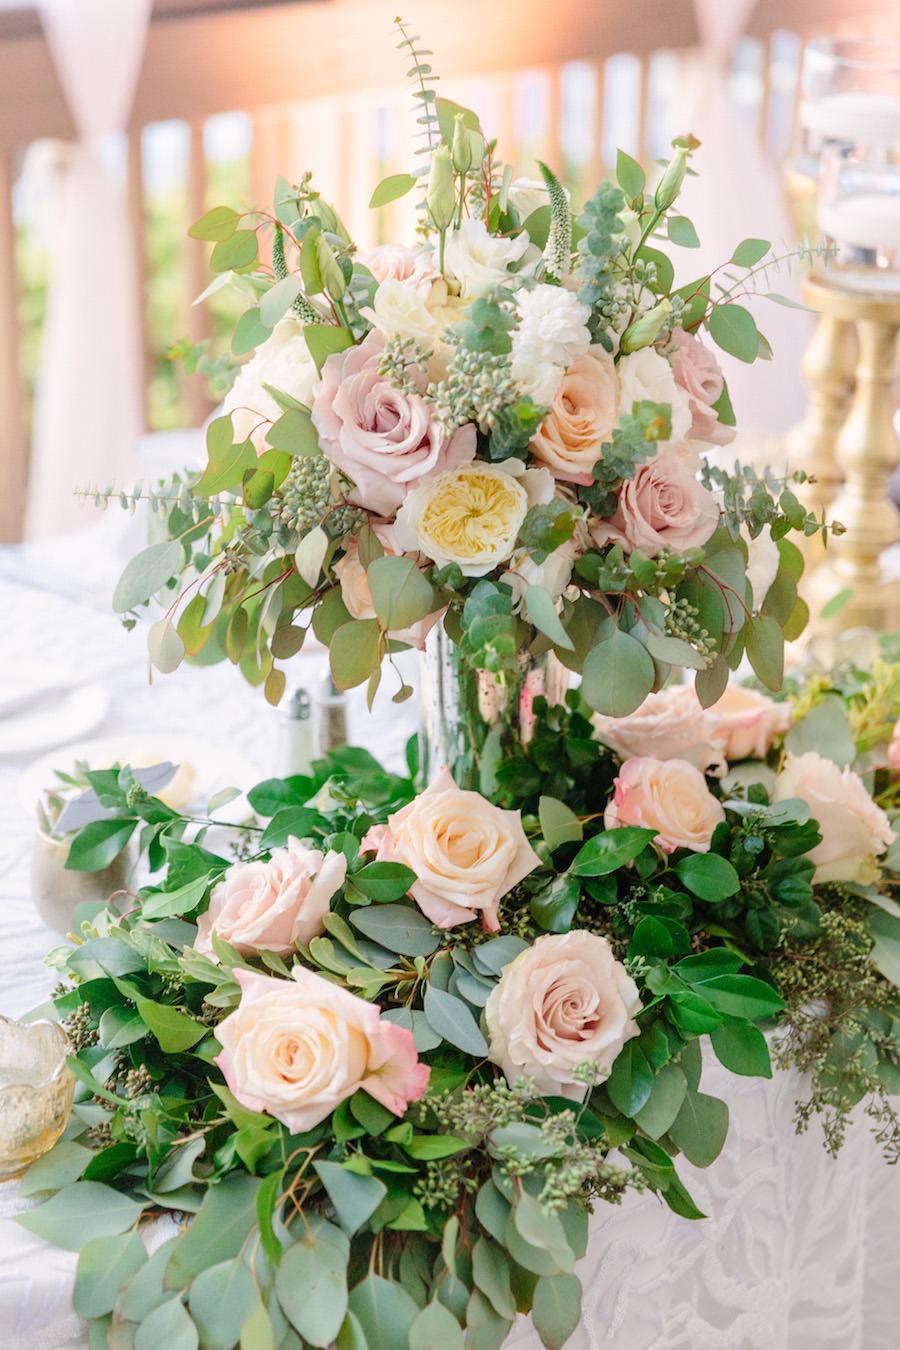 Tall Blush Pink Rose and Ranunculus Wedding Centerpiece Flowers with Eucalyptus Leaves   Wedding Centerpiece Decor Ideas